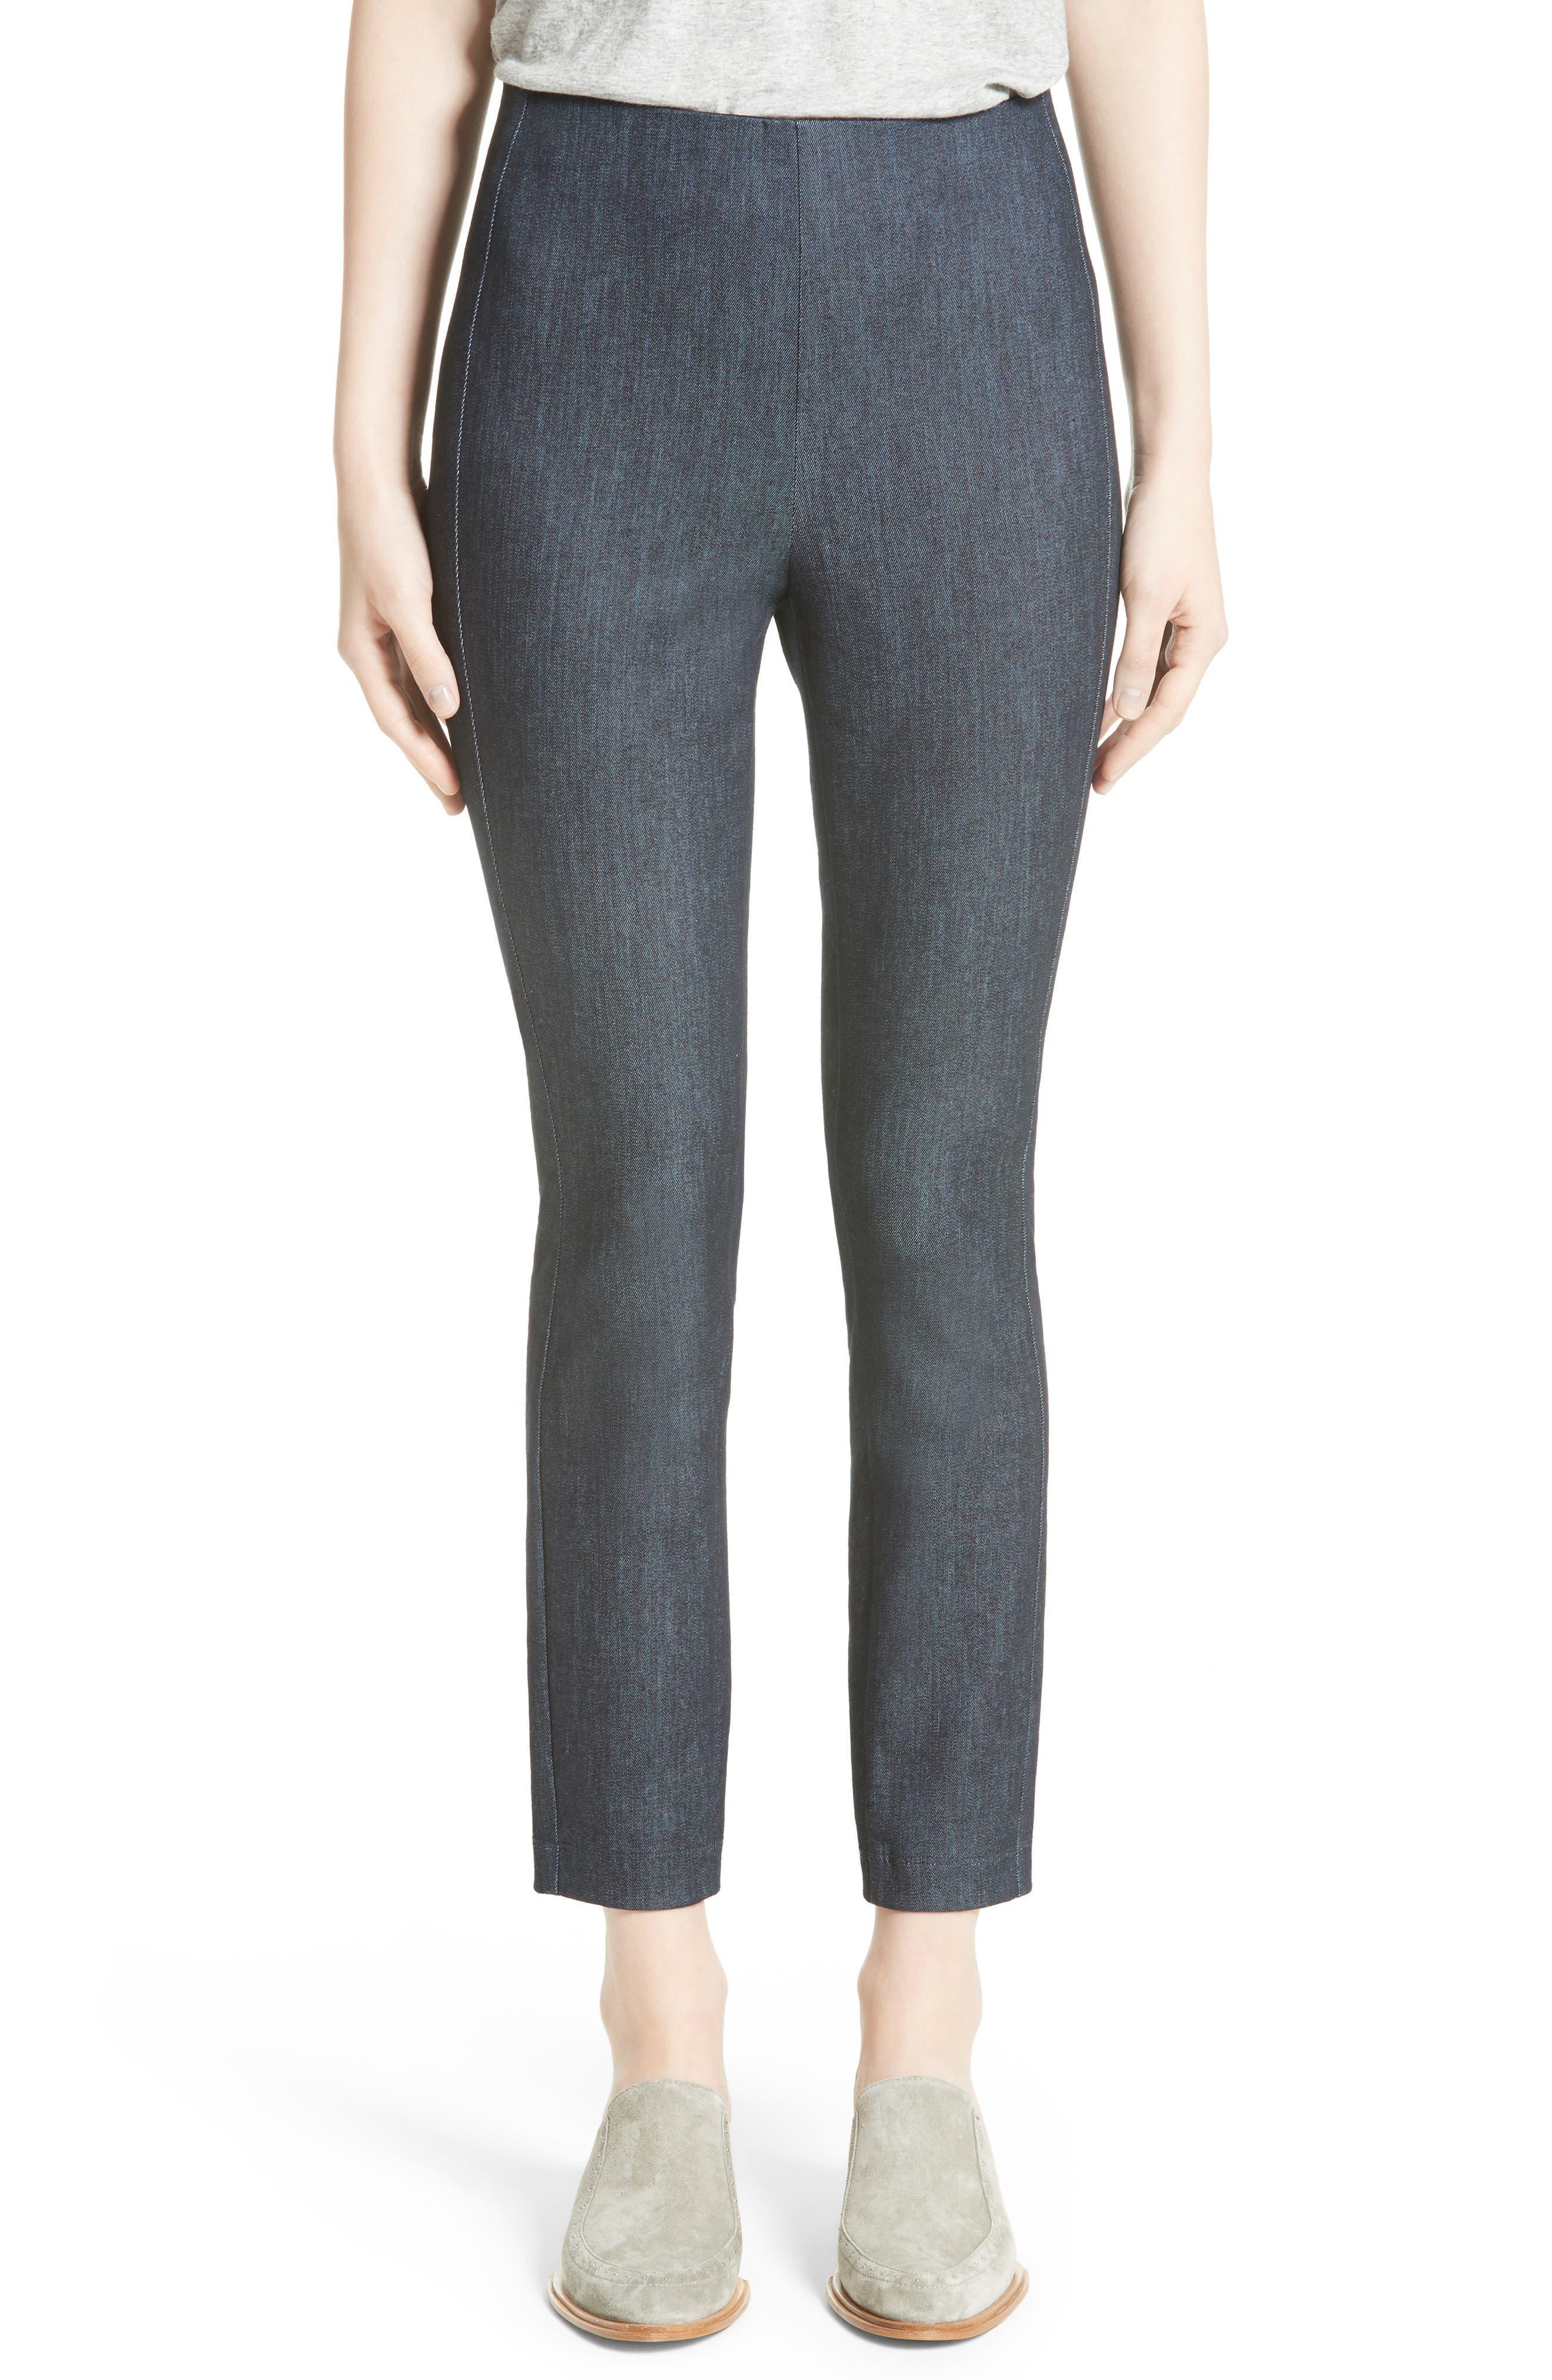 RAG & BONE Simone Slim Ankle Pants, Main, color, INDIGO